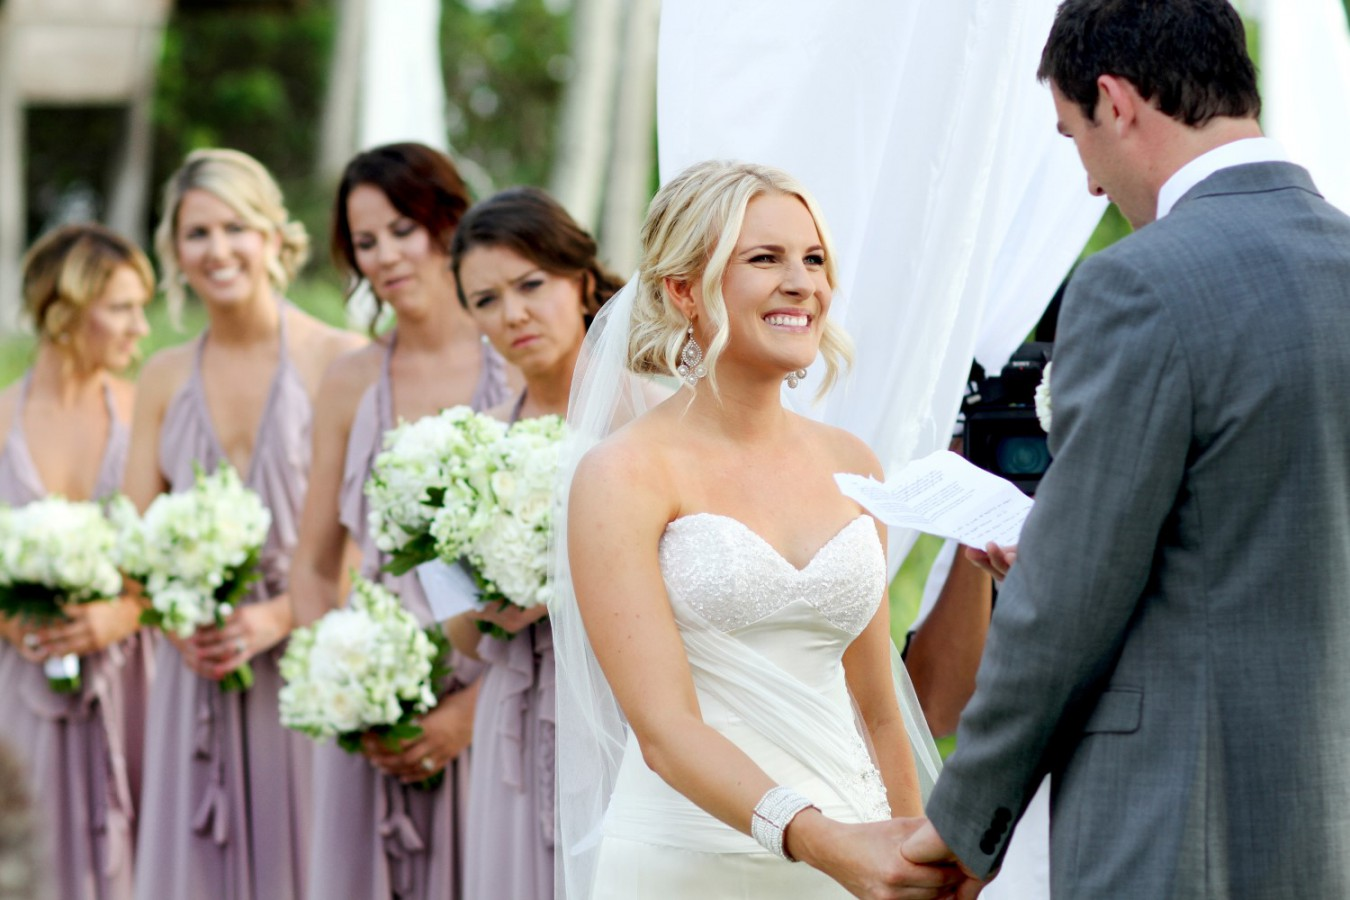 2011.10.16, Megann and Daniel, Ombak Luwung, MJY - Bali Wedding Paradise (17)